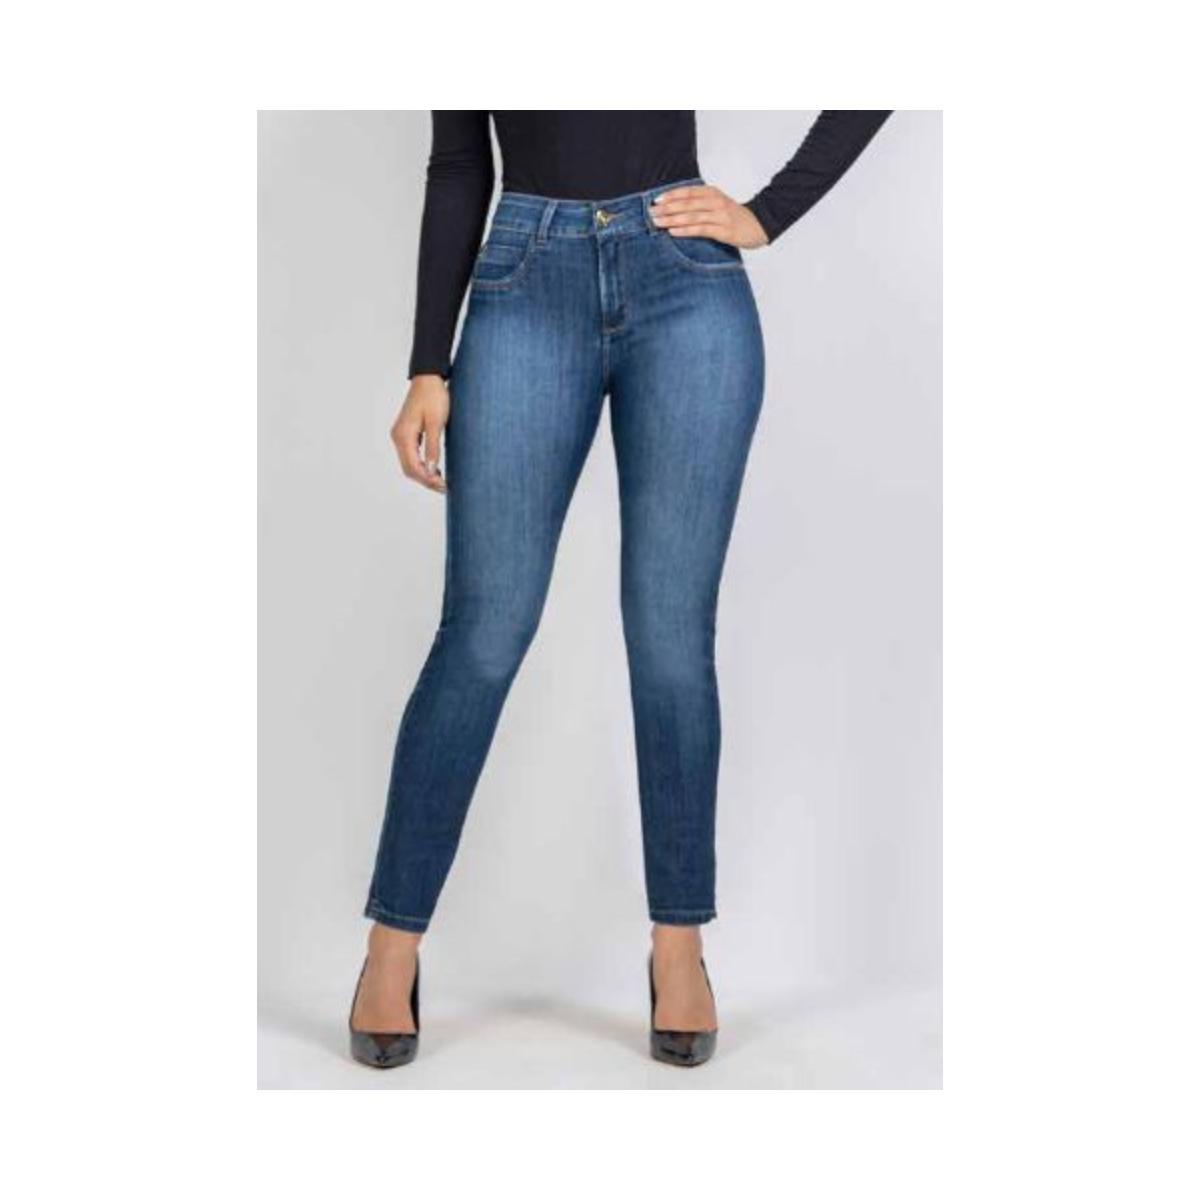 Calça Feminina Kacolako K37825 Jeans